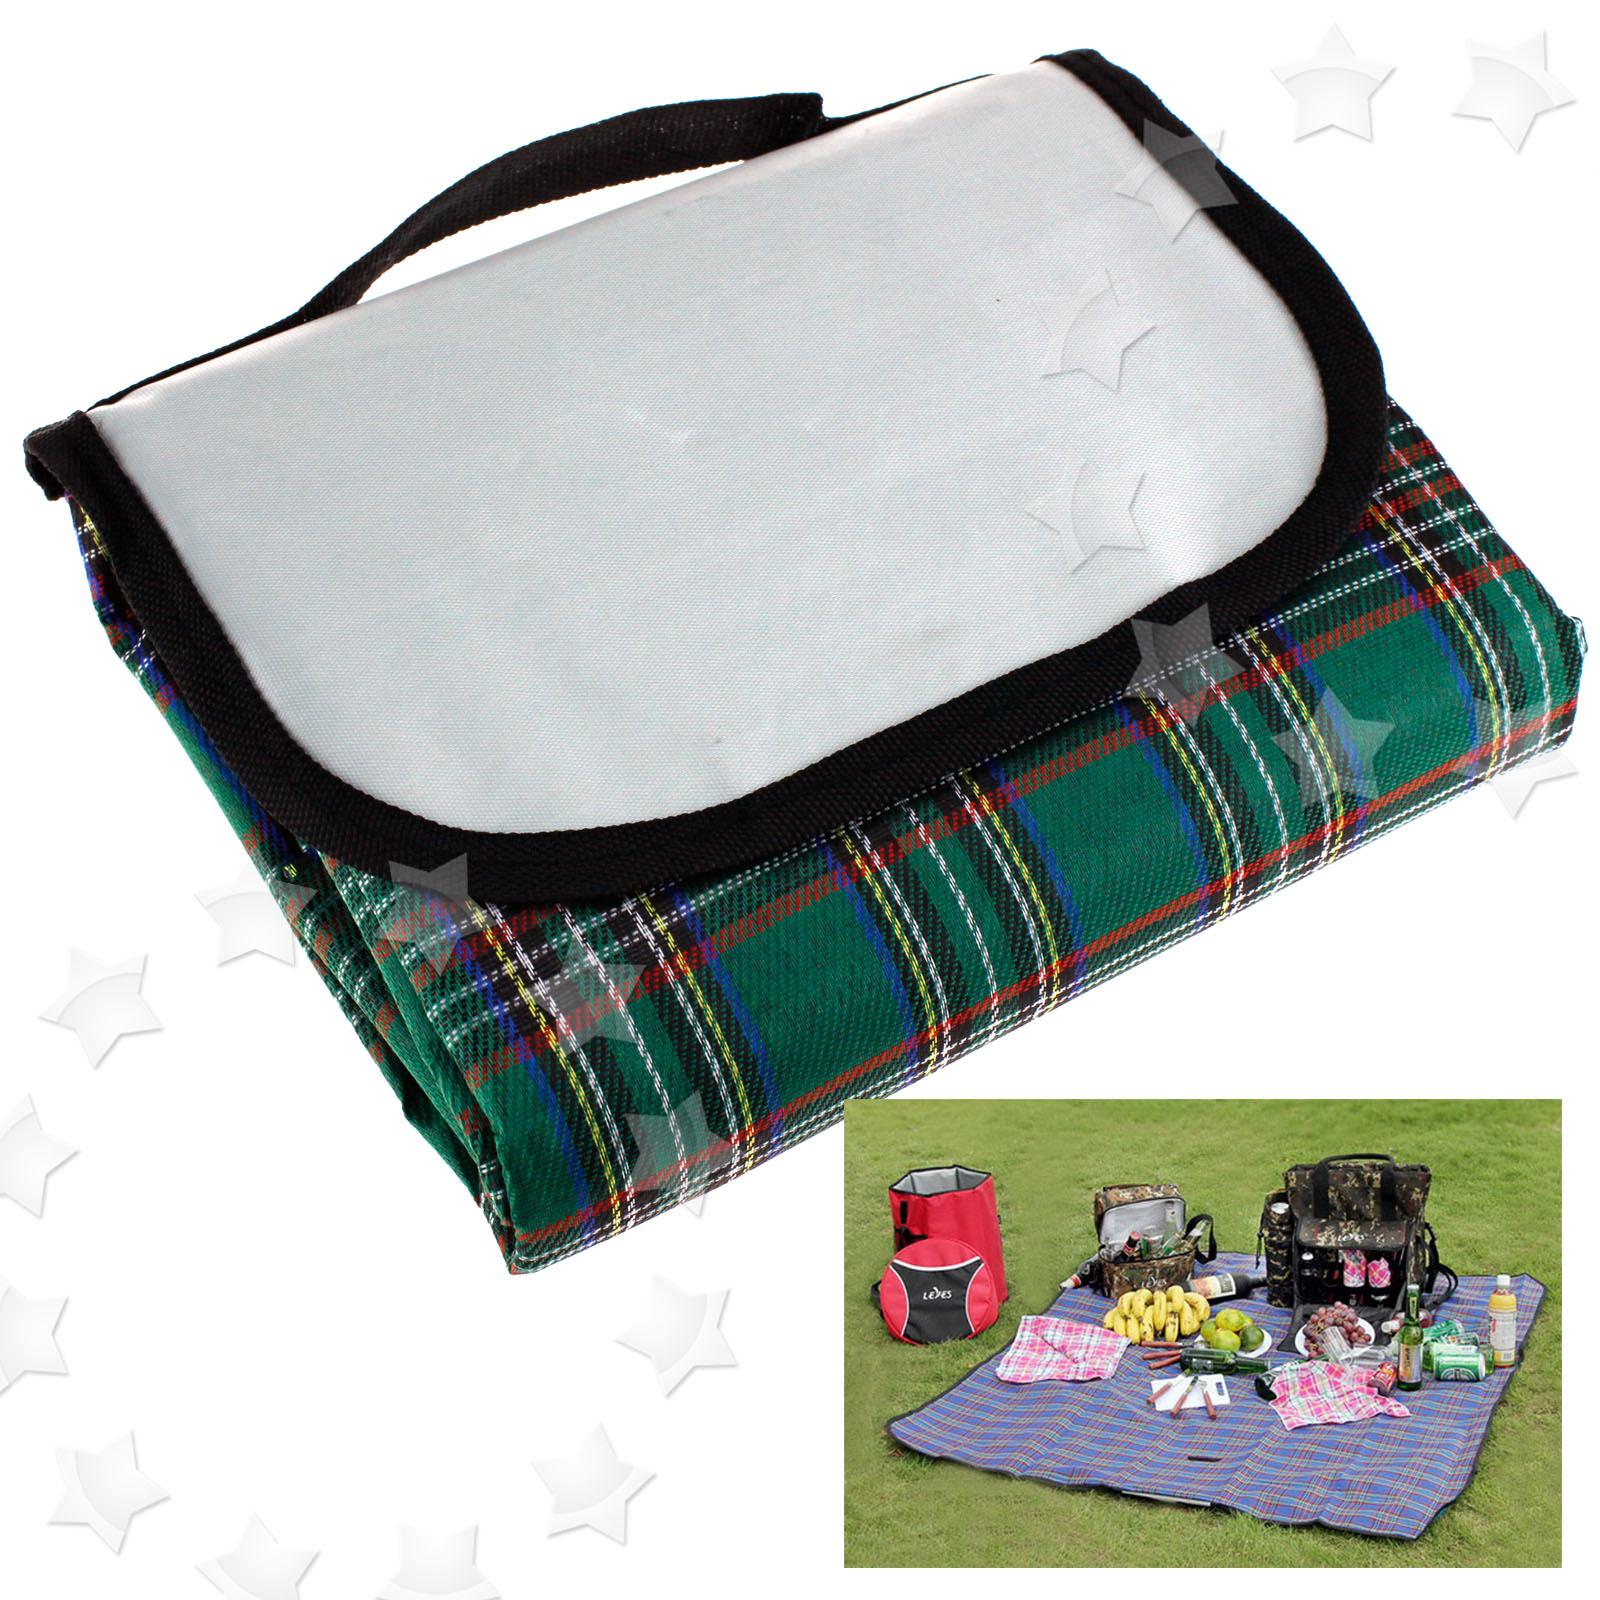 "Picnic Blanket: Outdoor Green 57x76"" Waterproof Picnic Blanket Rug Travel"